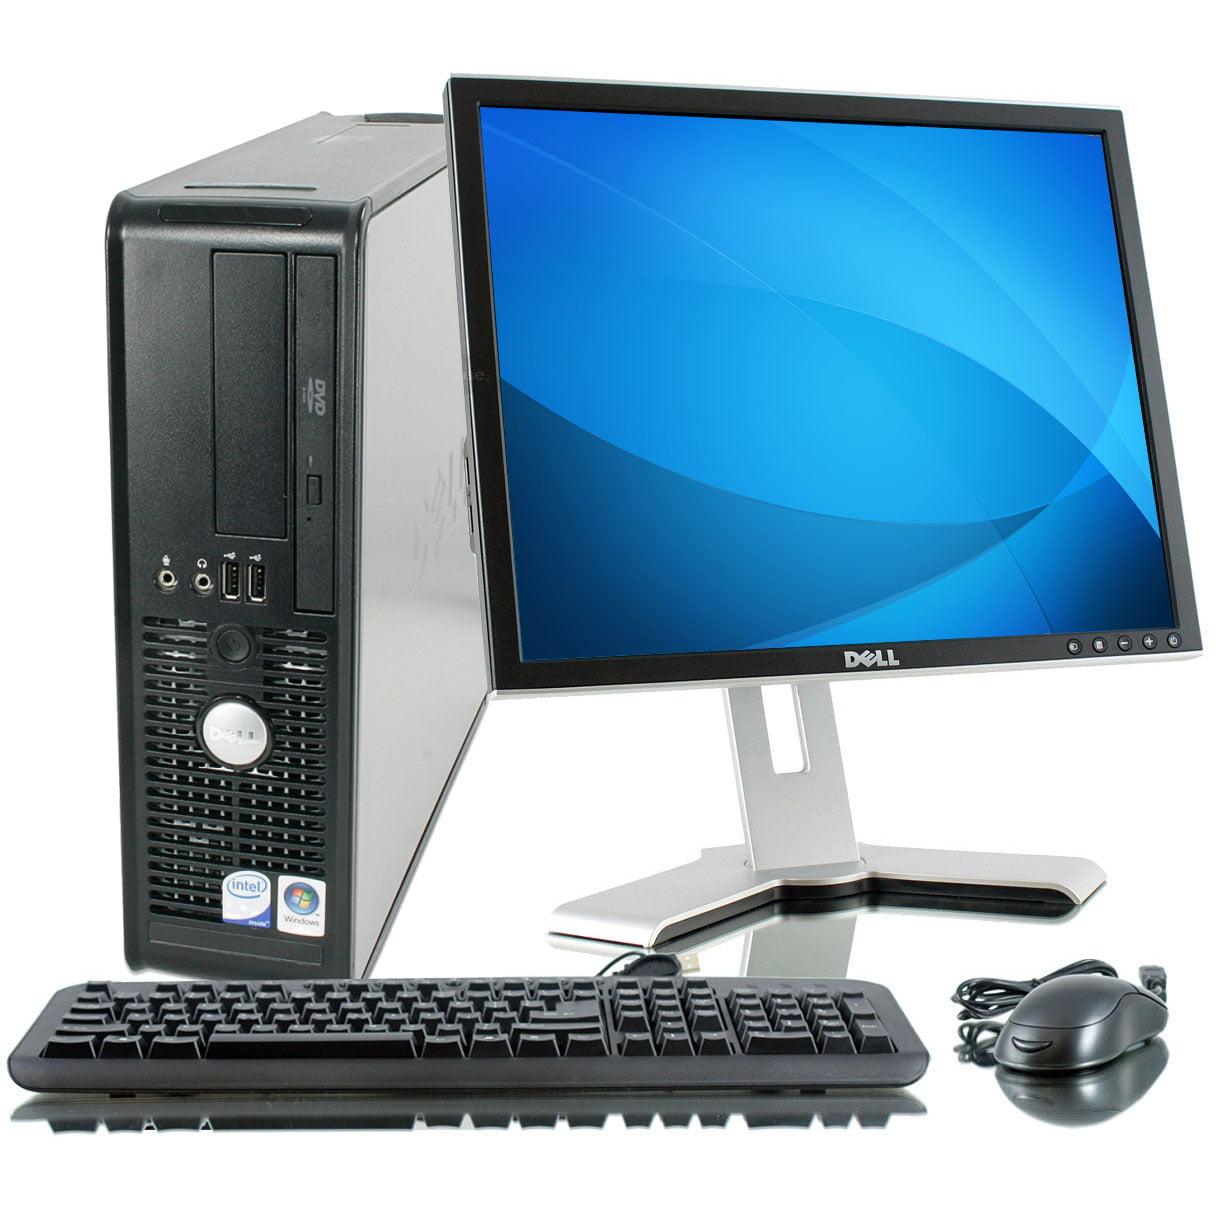 "REFURBISHED: Optiplex GX620 Small Form Factor - 400GB HDD, 4GB Ram, DVD-Rom, 17"" LCD Monitor, Windows 7 Professional"